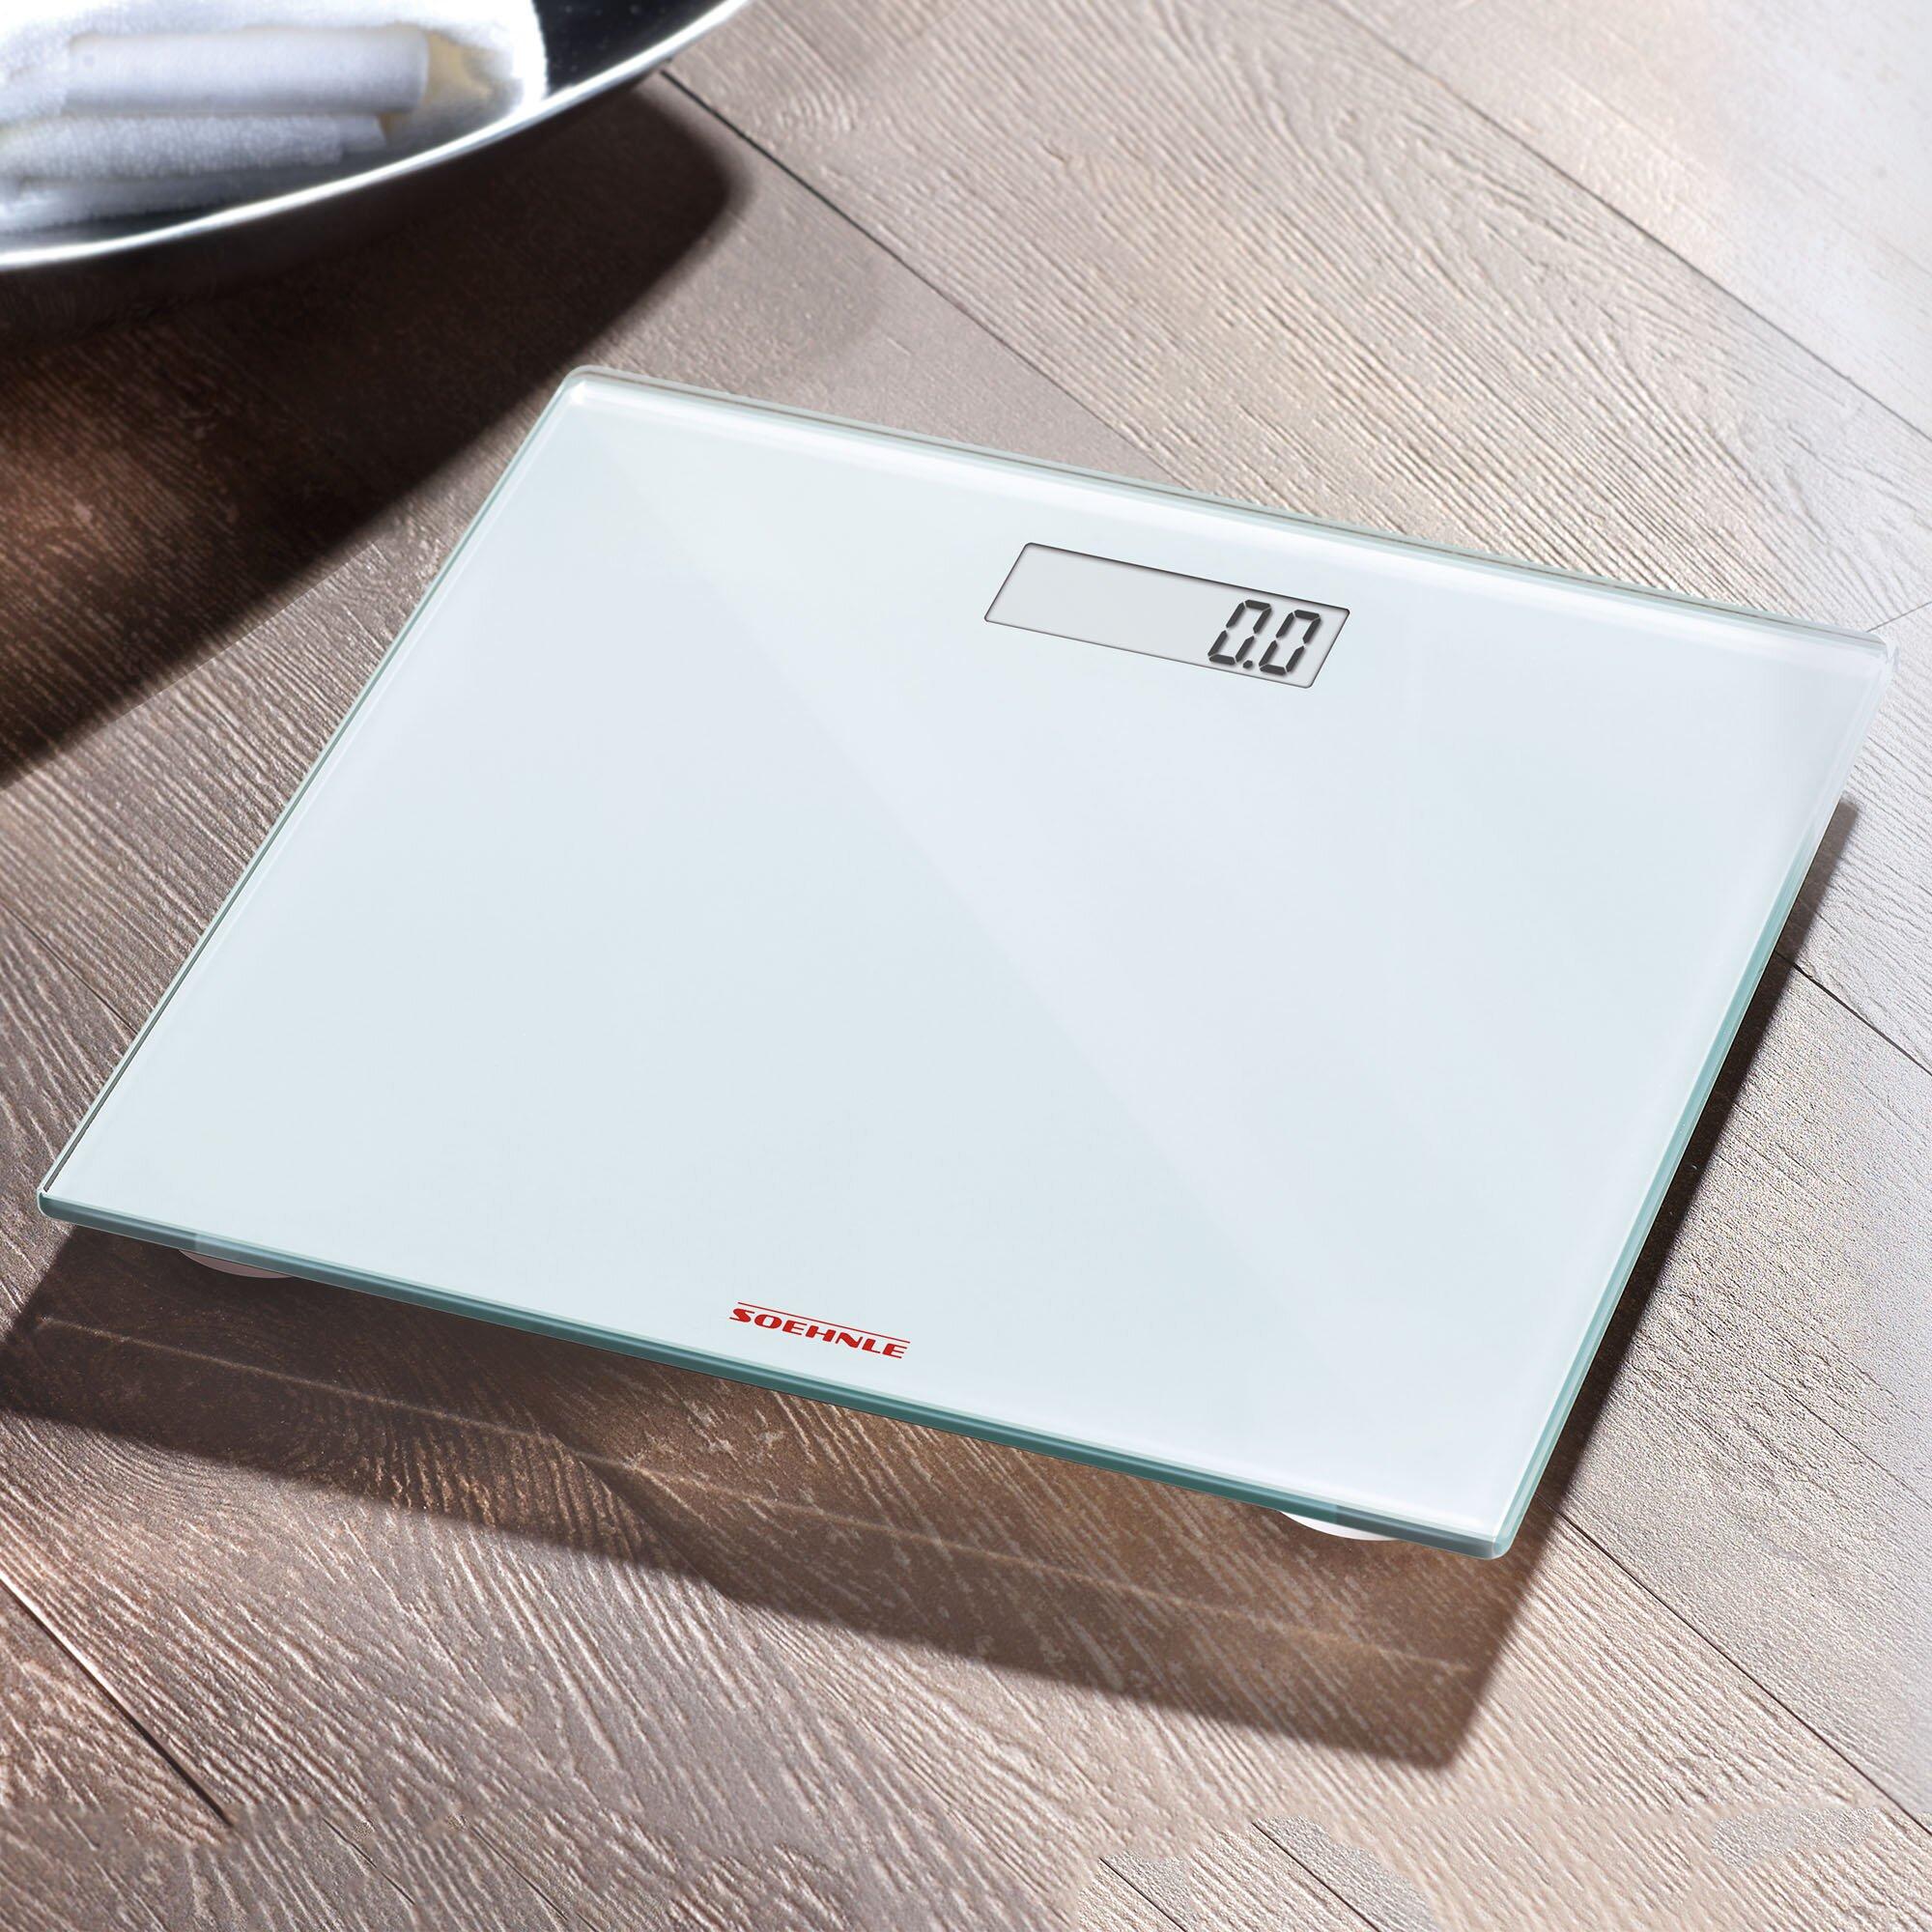 soehnle pino precision digital bathroom scale & reviews | wayfair